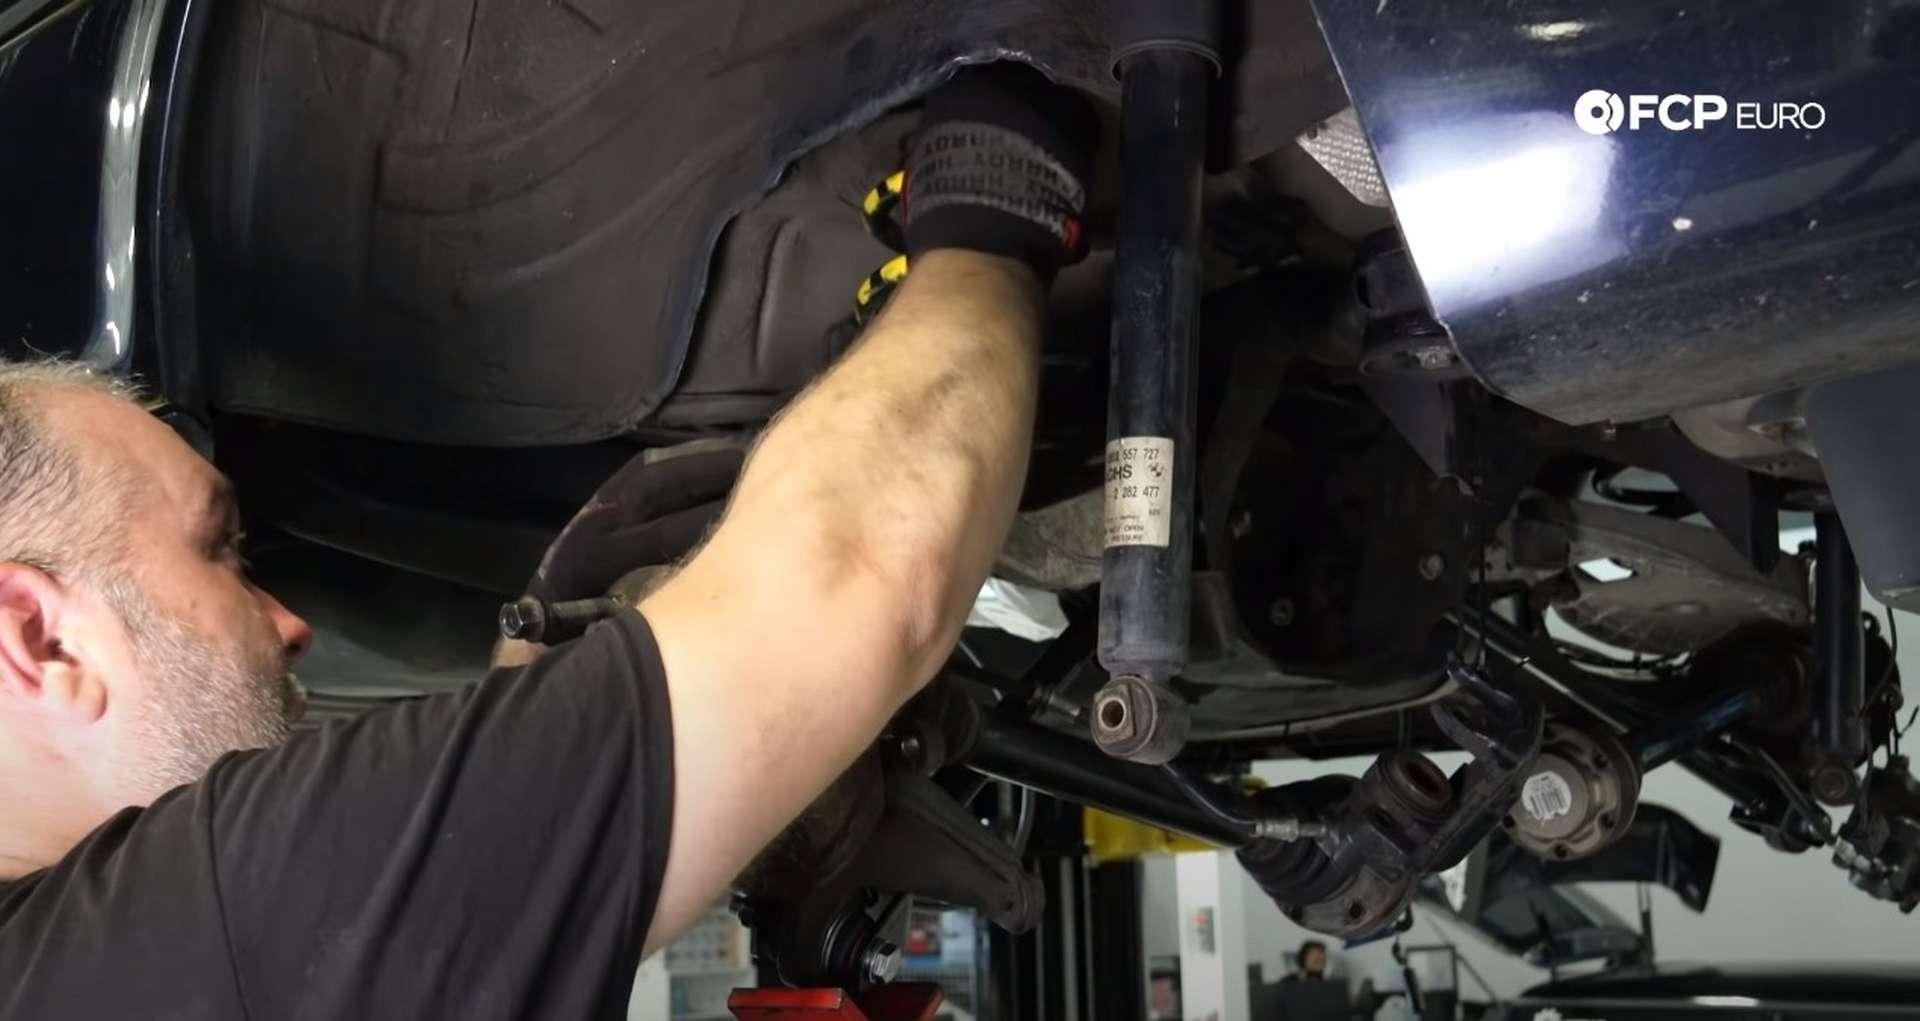 DIY E46 BMW M3 Rear Subframe Refresh Part 3 installing the spring